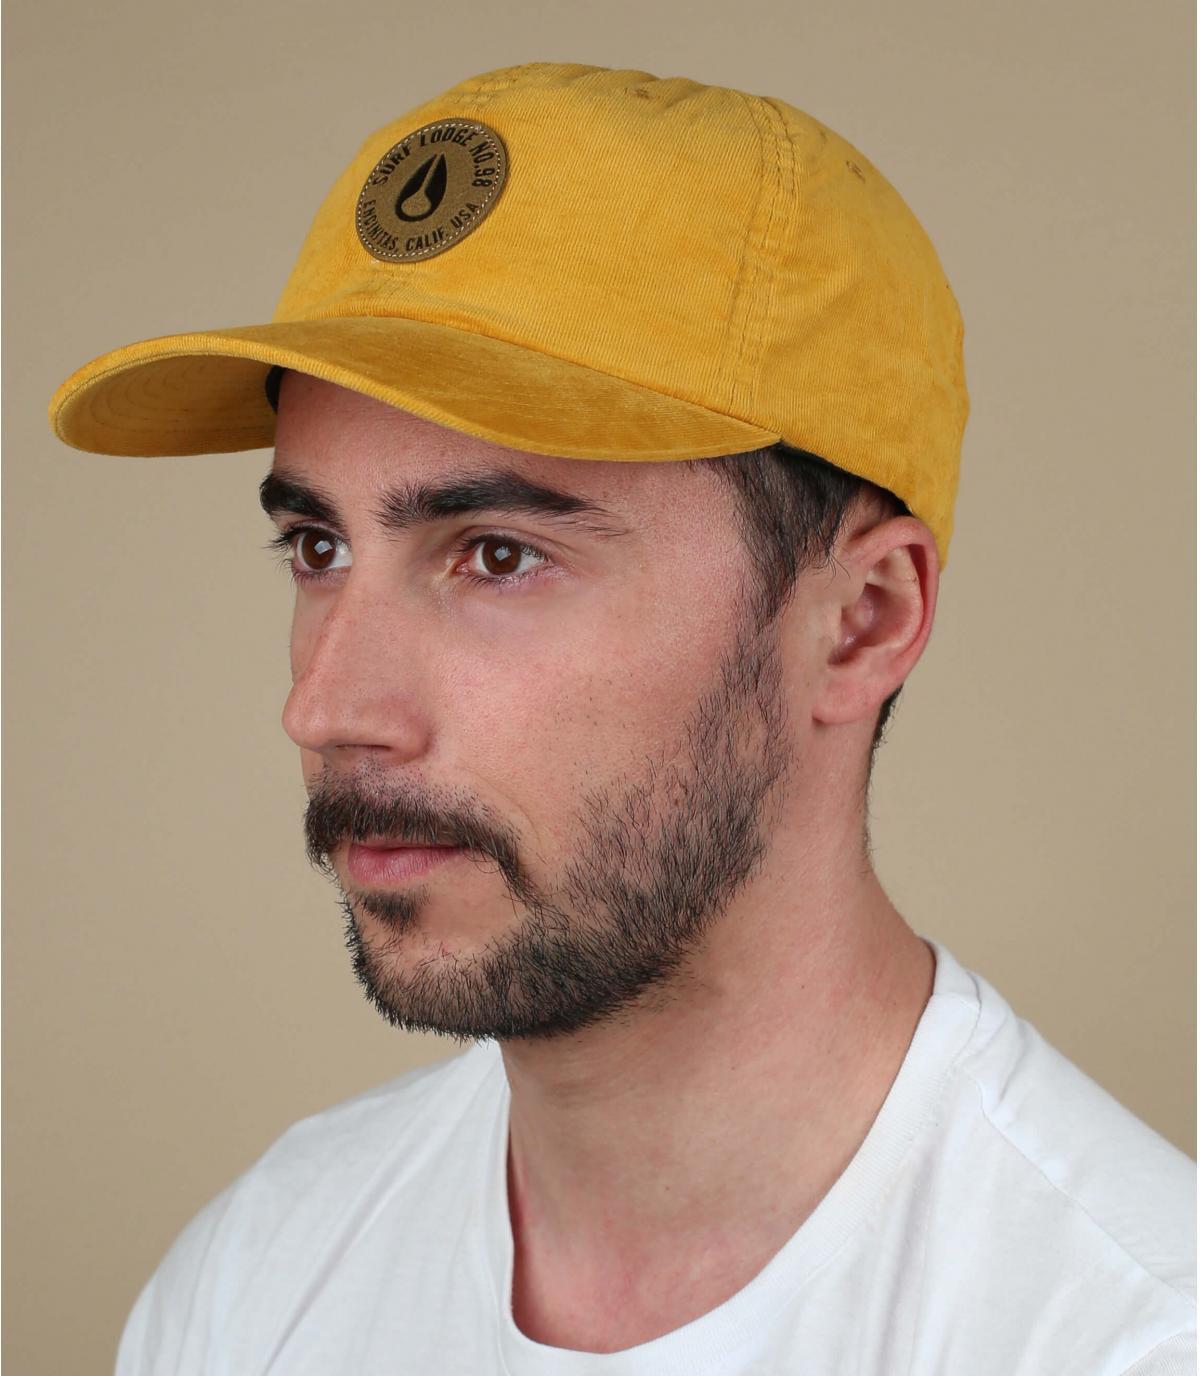 cappellino Nixon beige